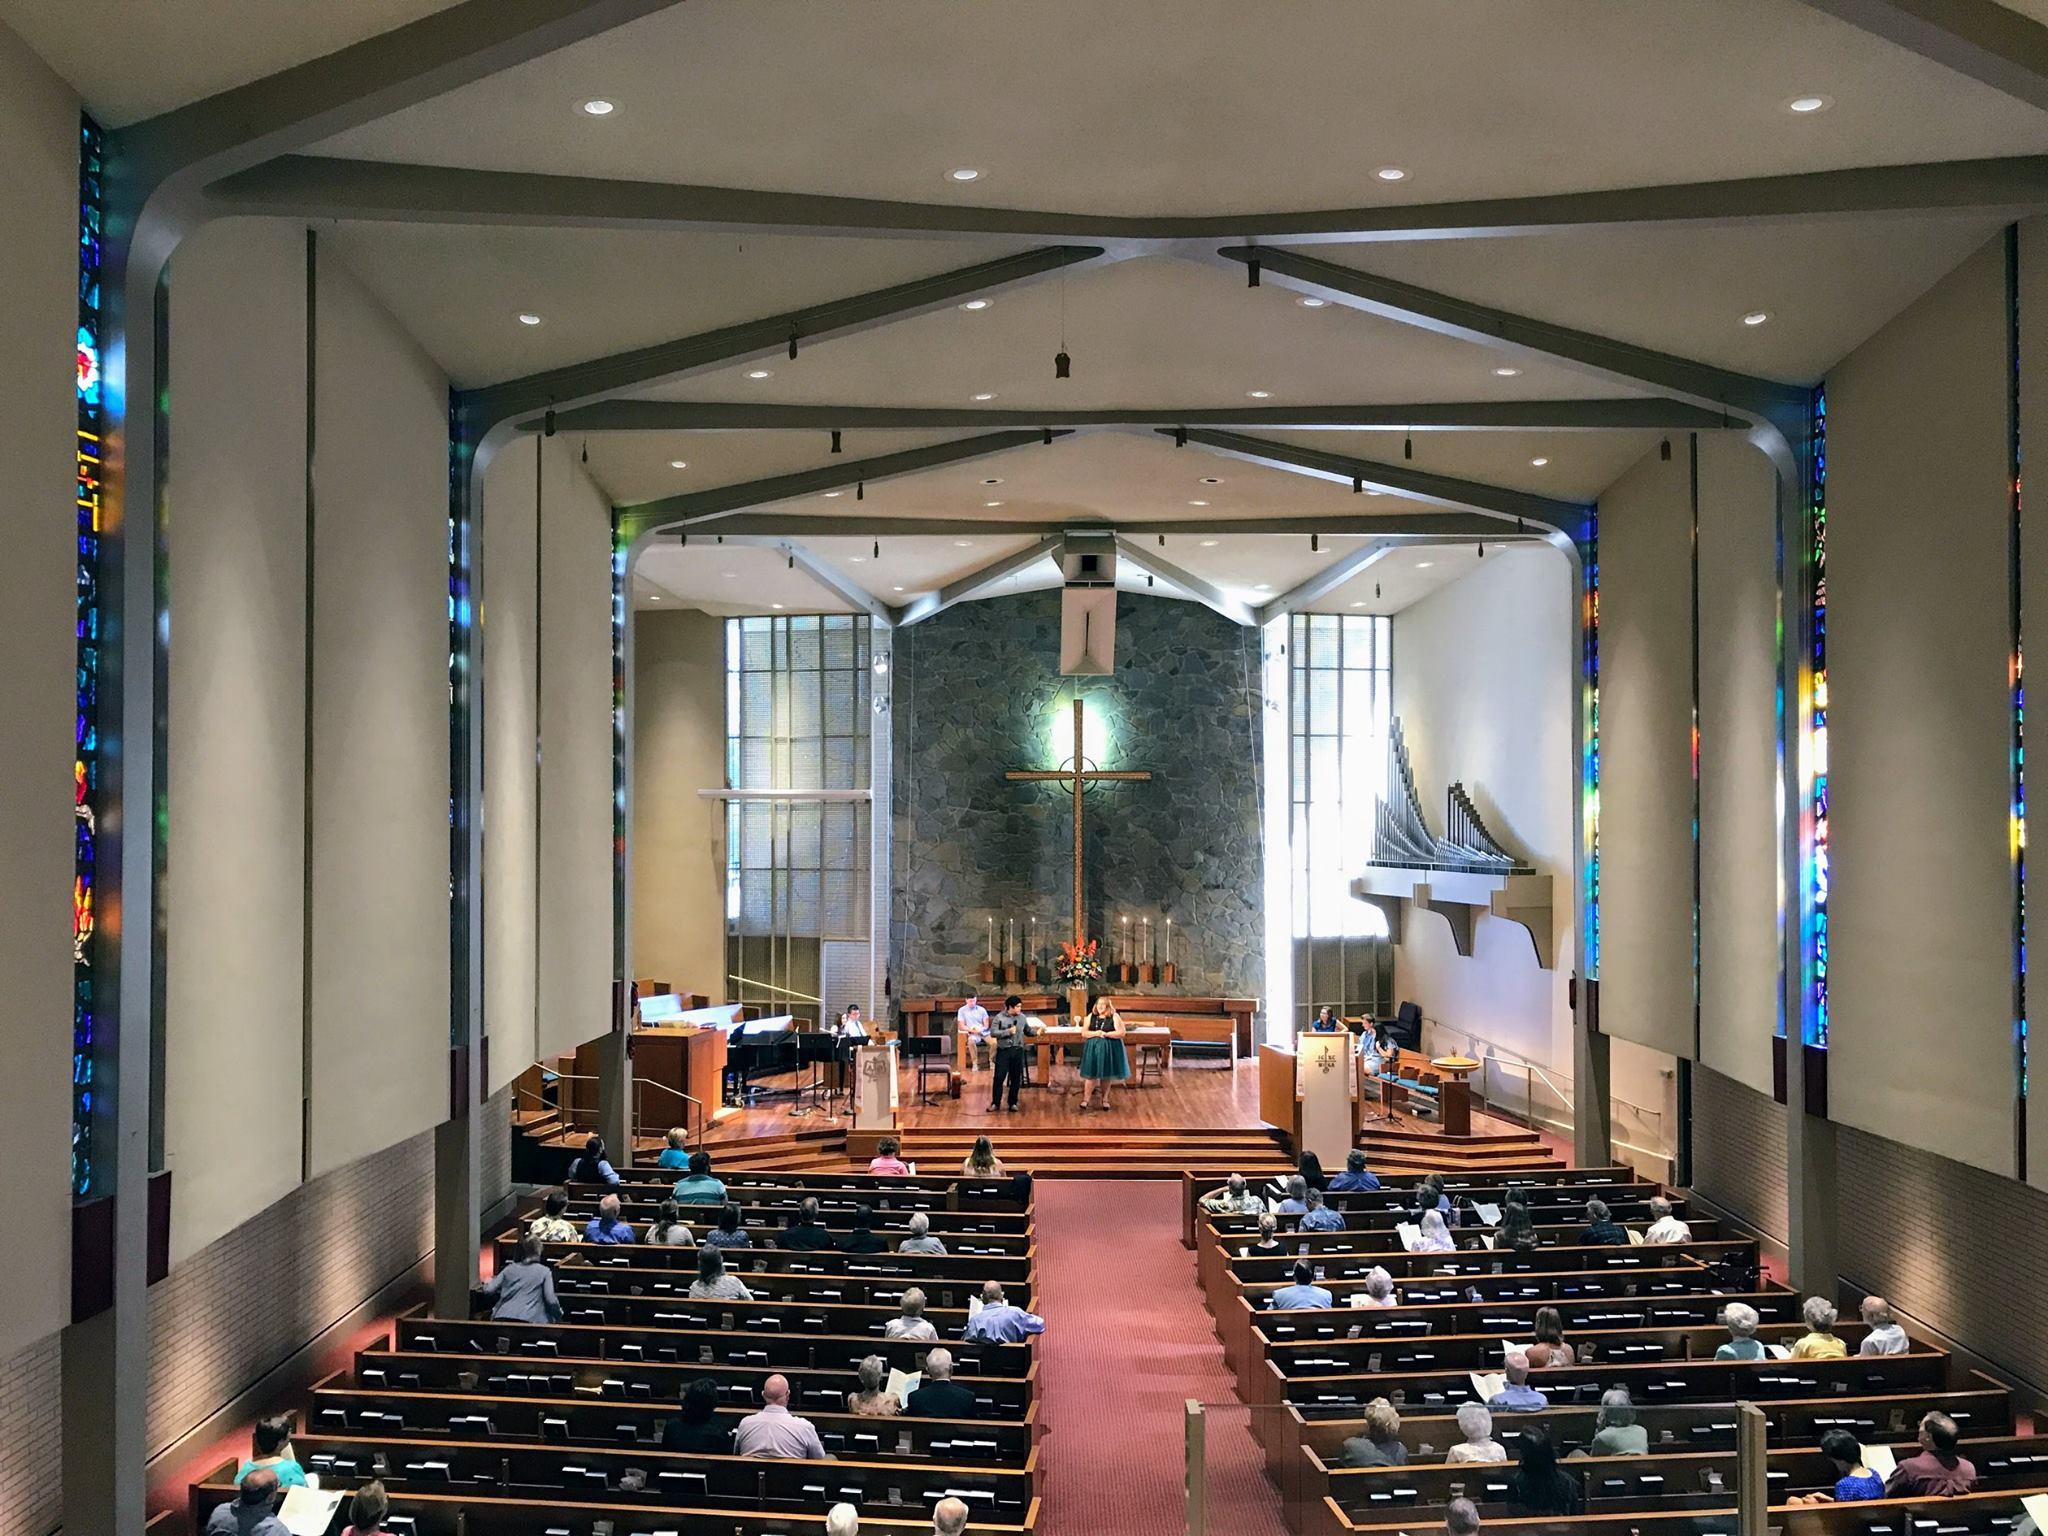 claremont-presbyterian-church-view-wide.jpg